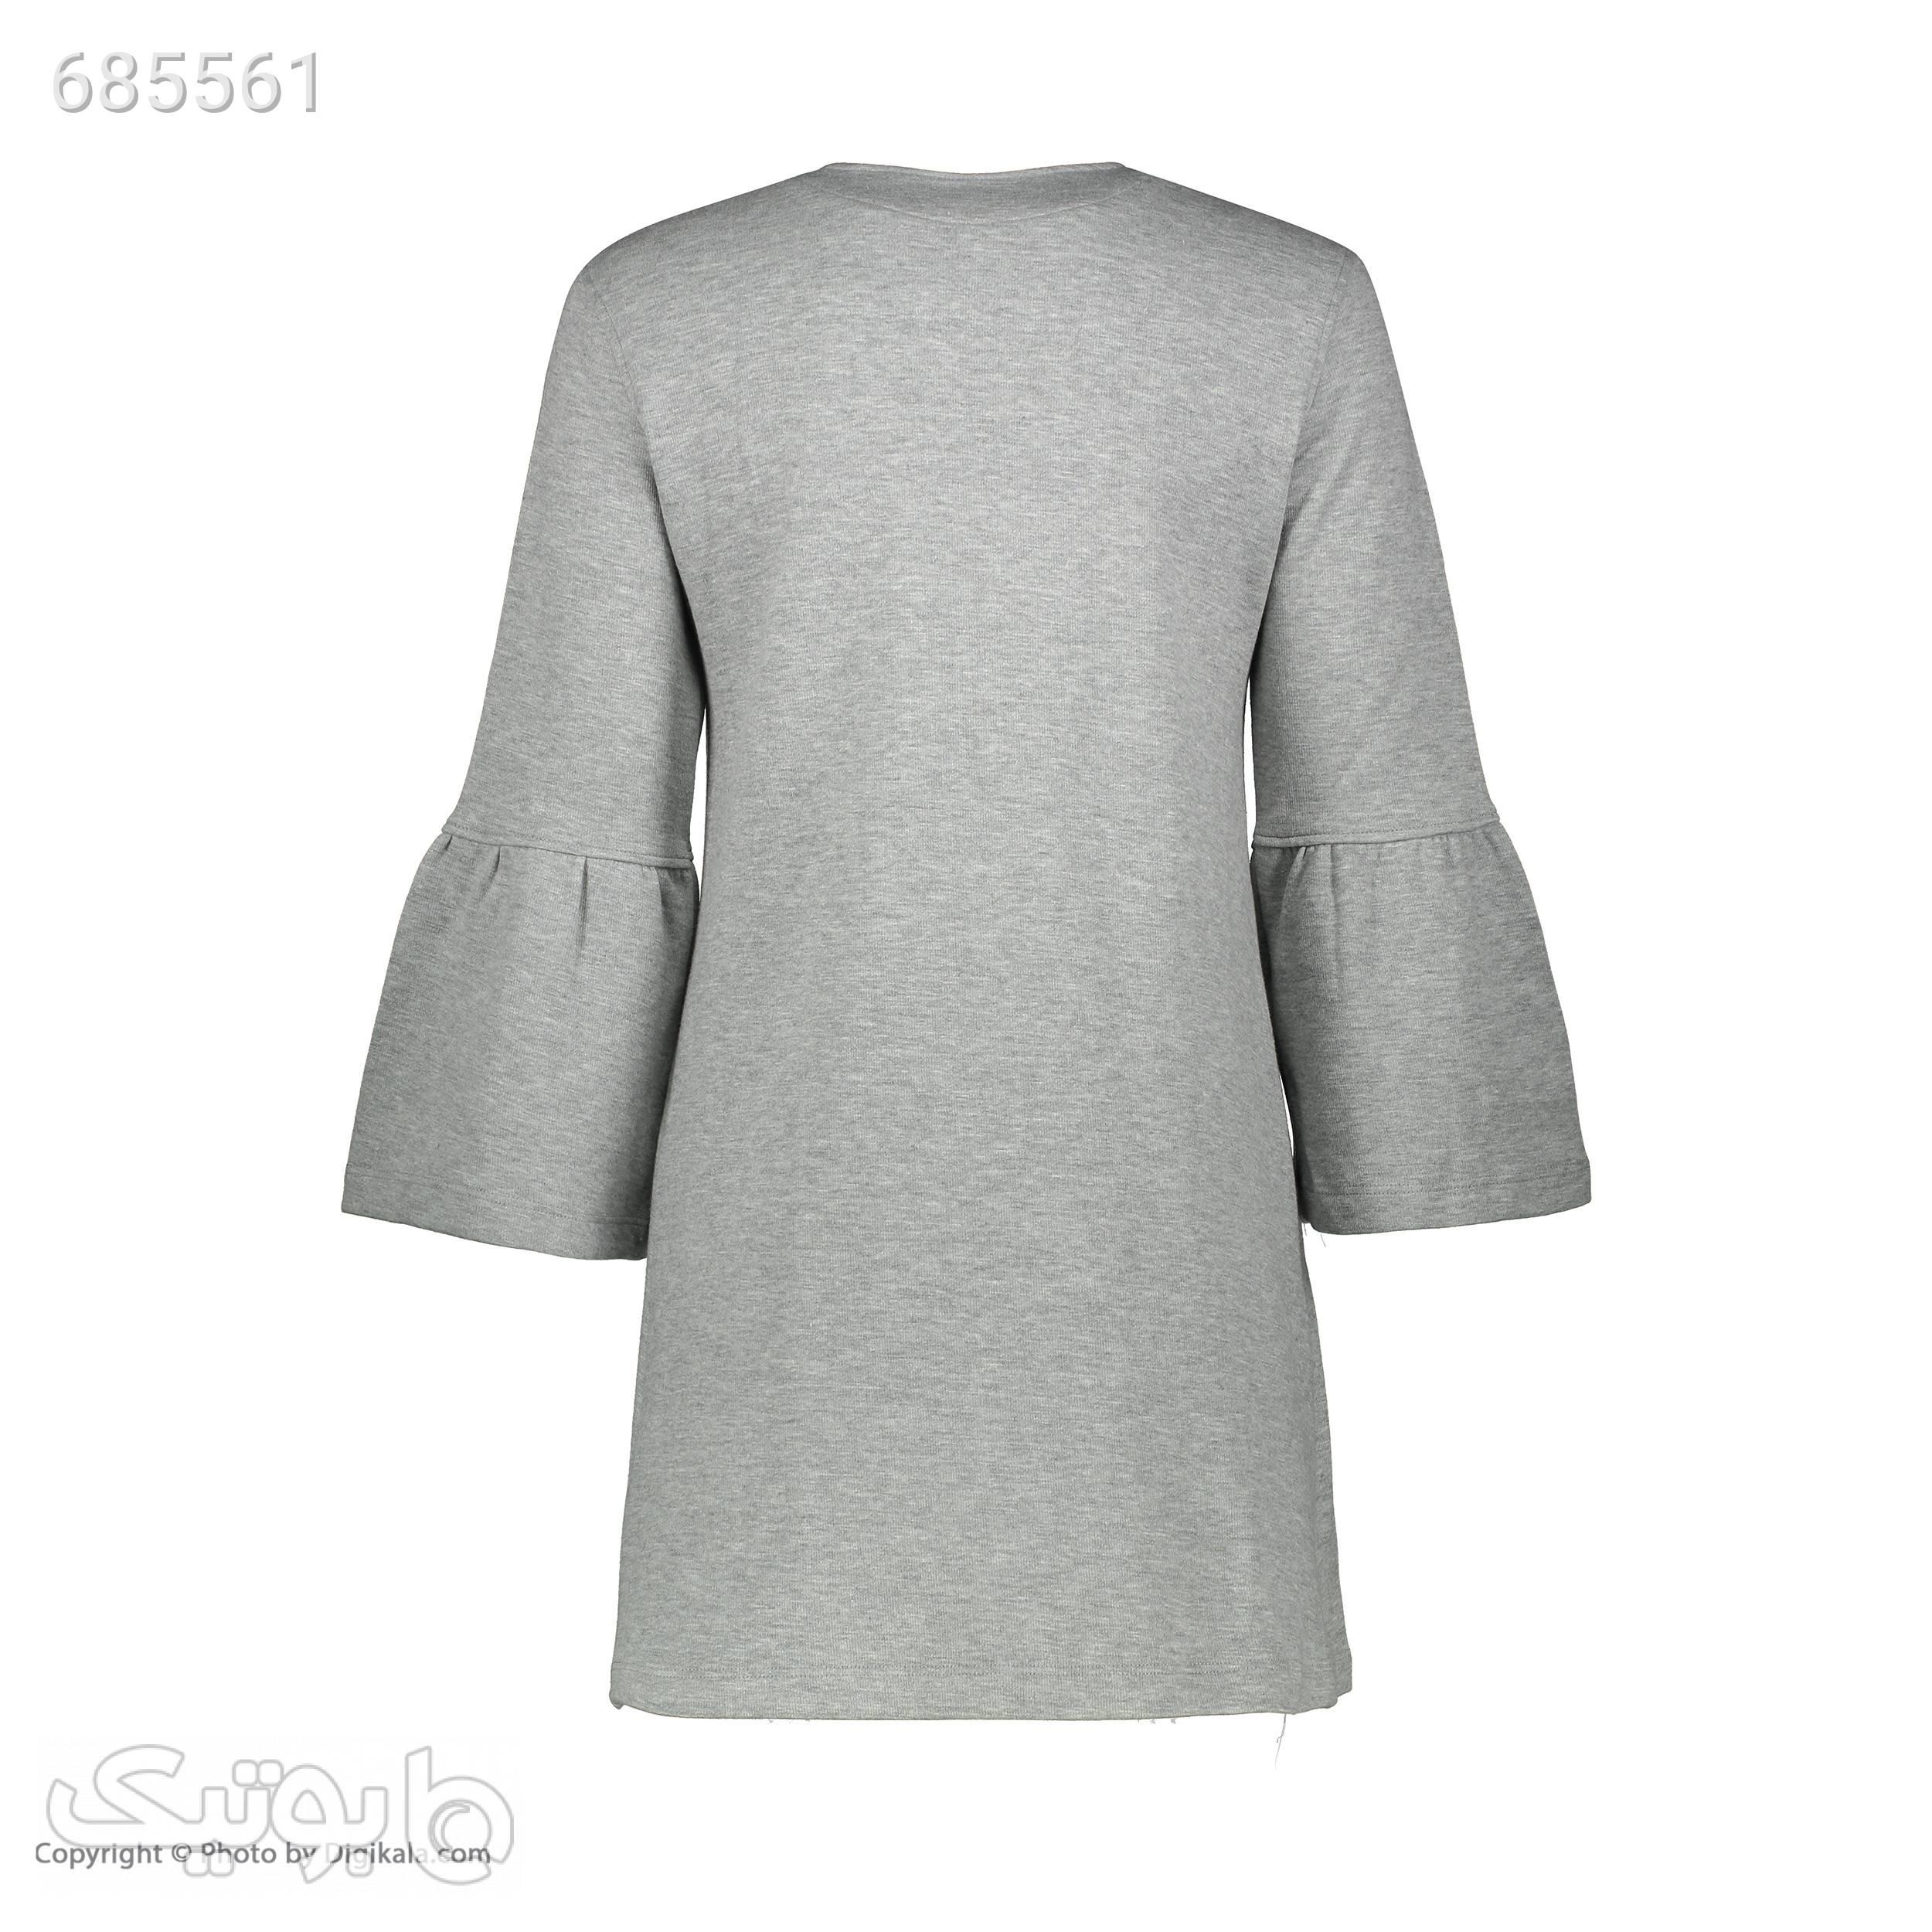 مانتو زنانه جامه پوش آرا مدل 410201803467 طوسی مانتو